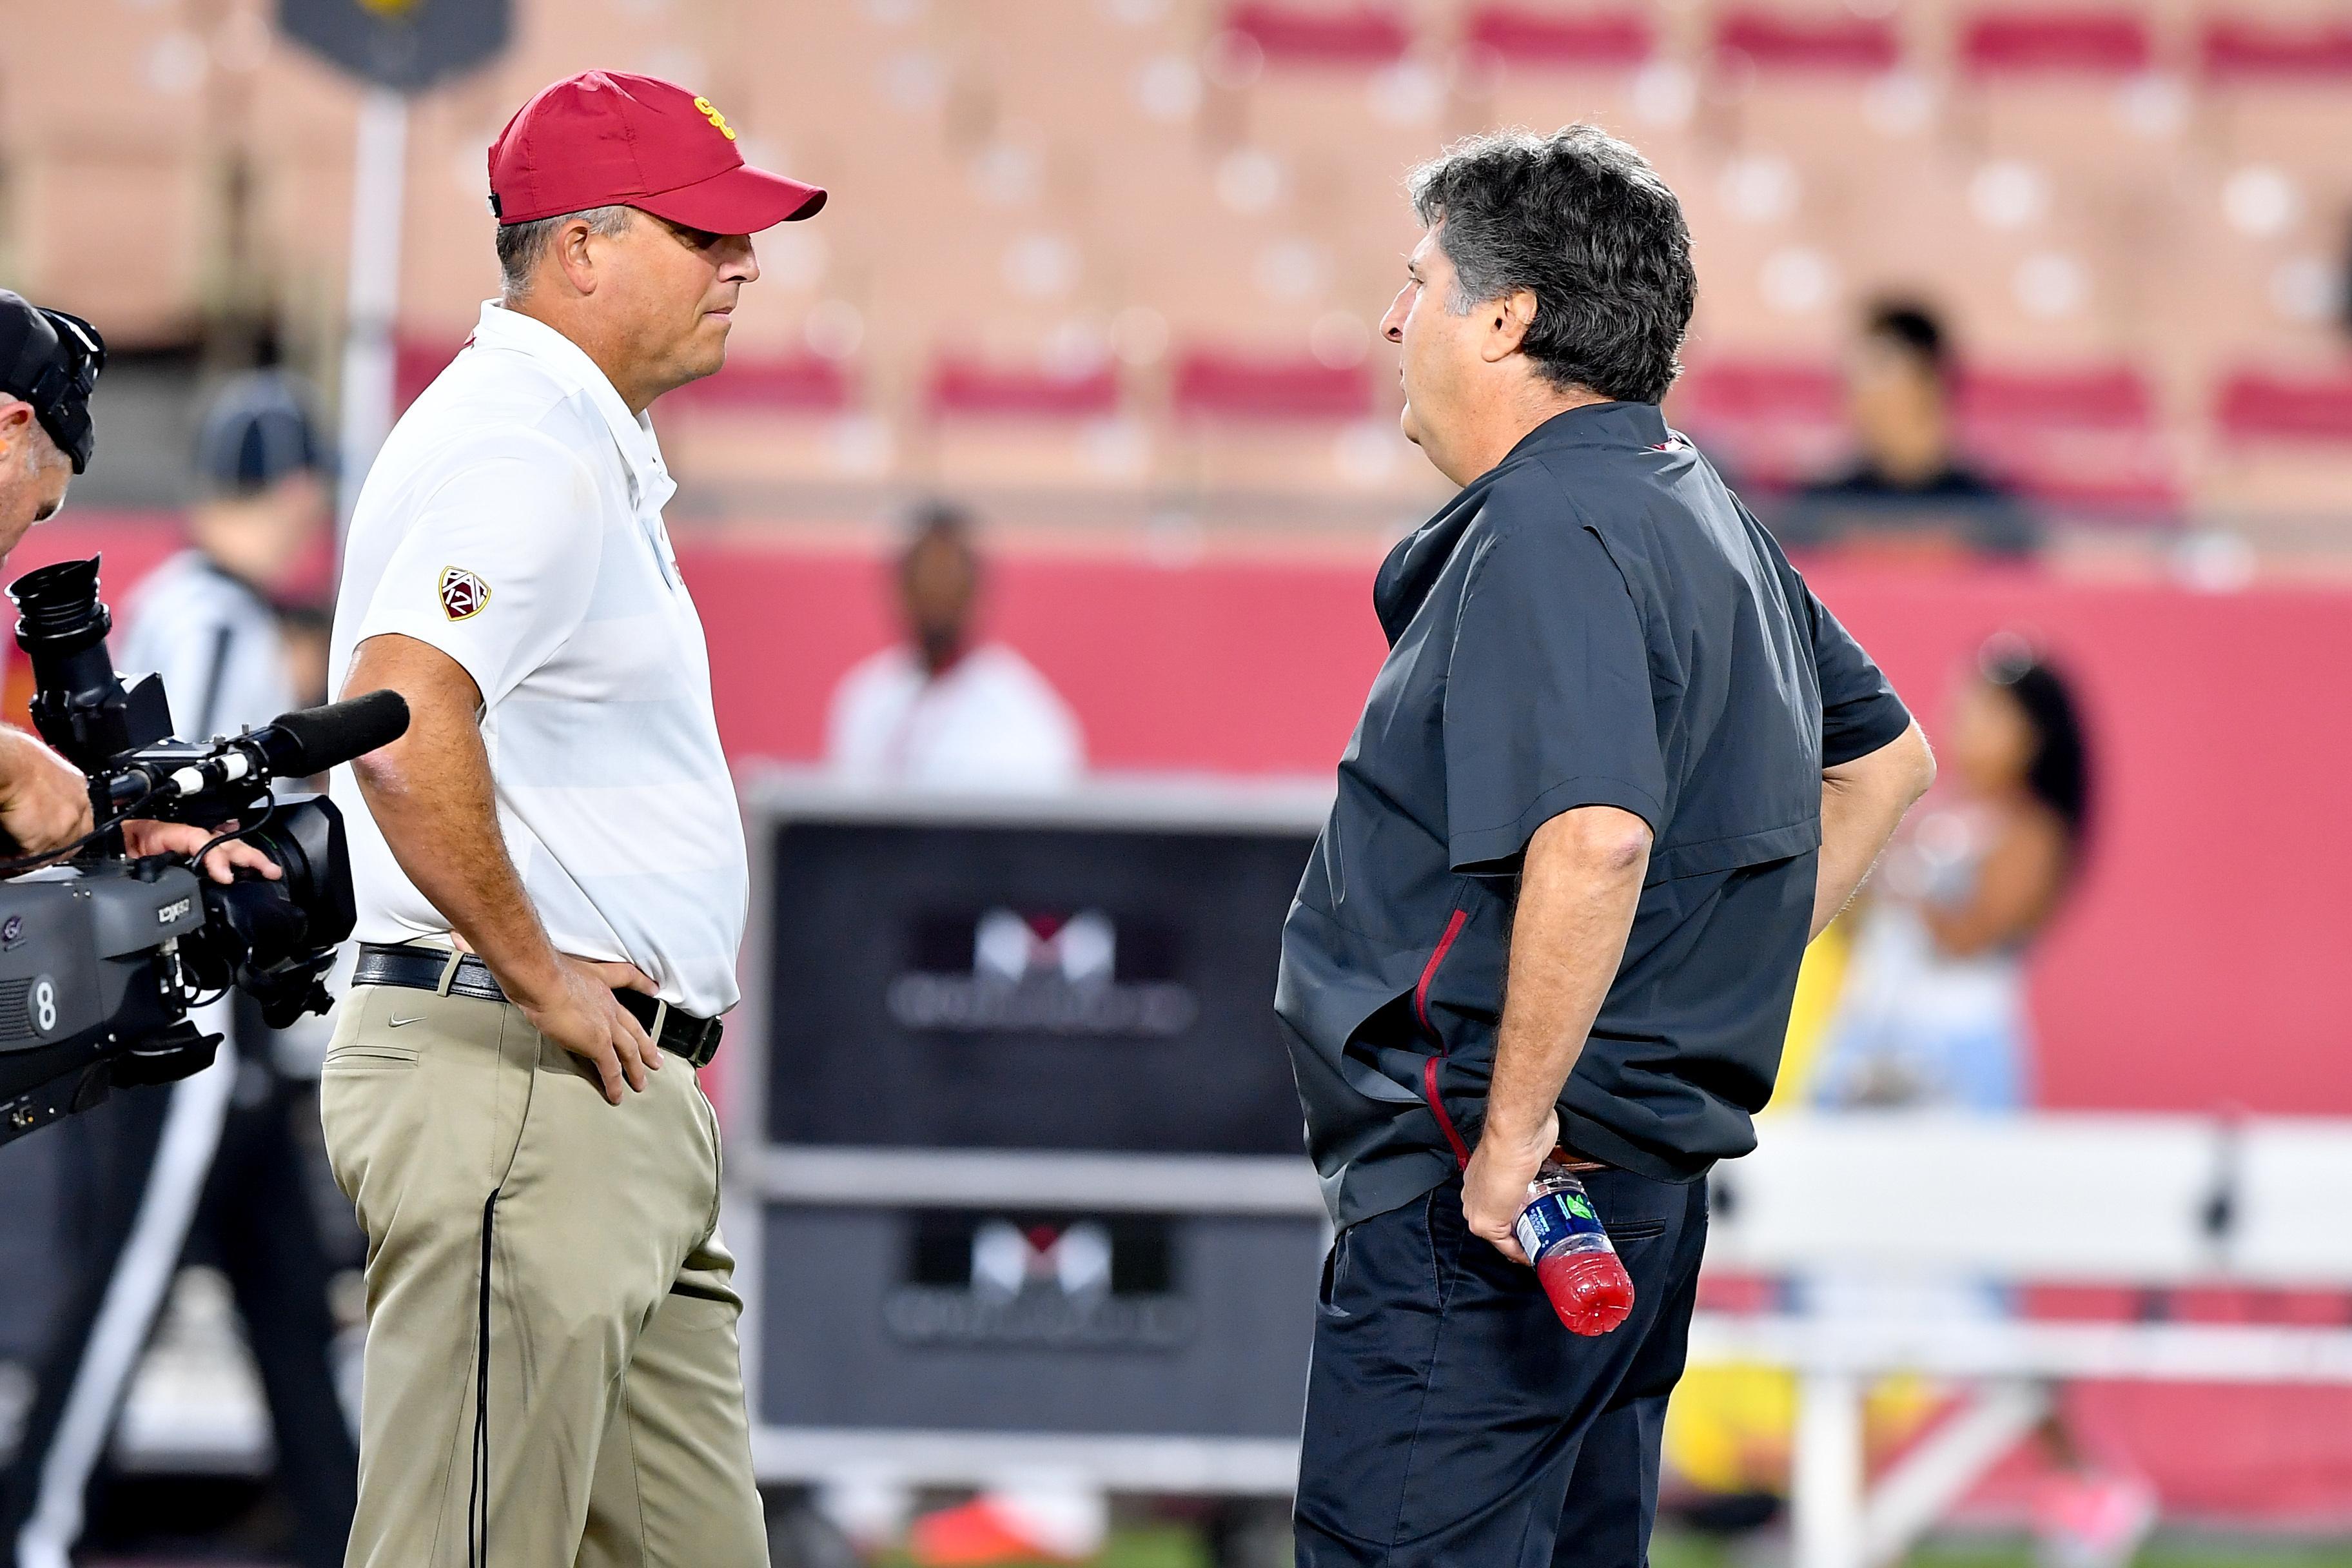 c6b4eafc67a Washington State Cougars head coach Mike Leach and USC Trojans head coach  Clay Helton chat before